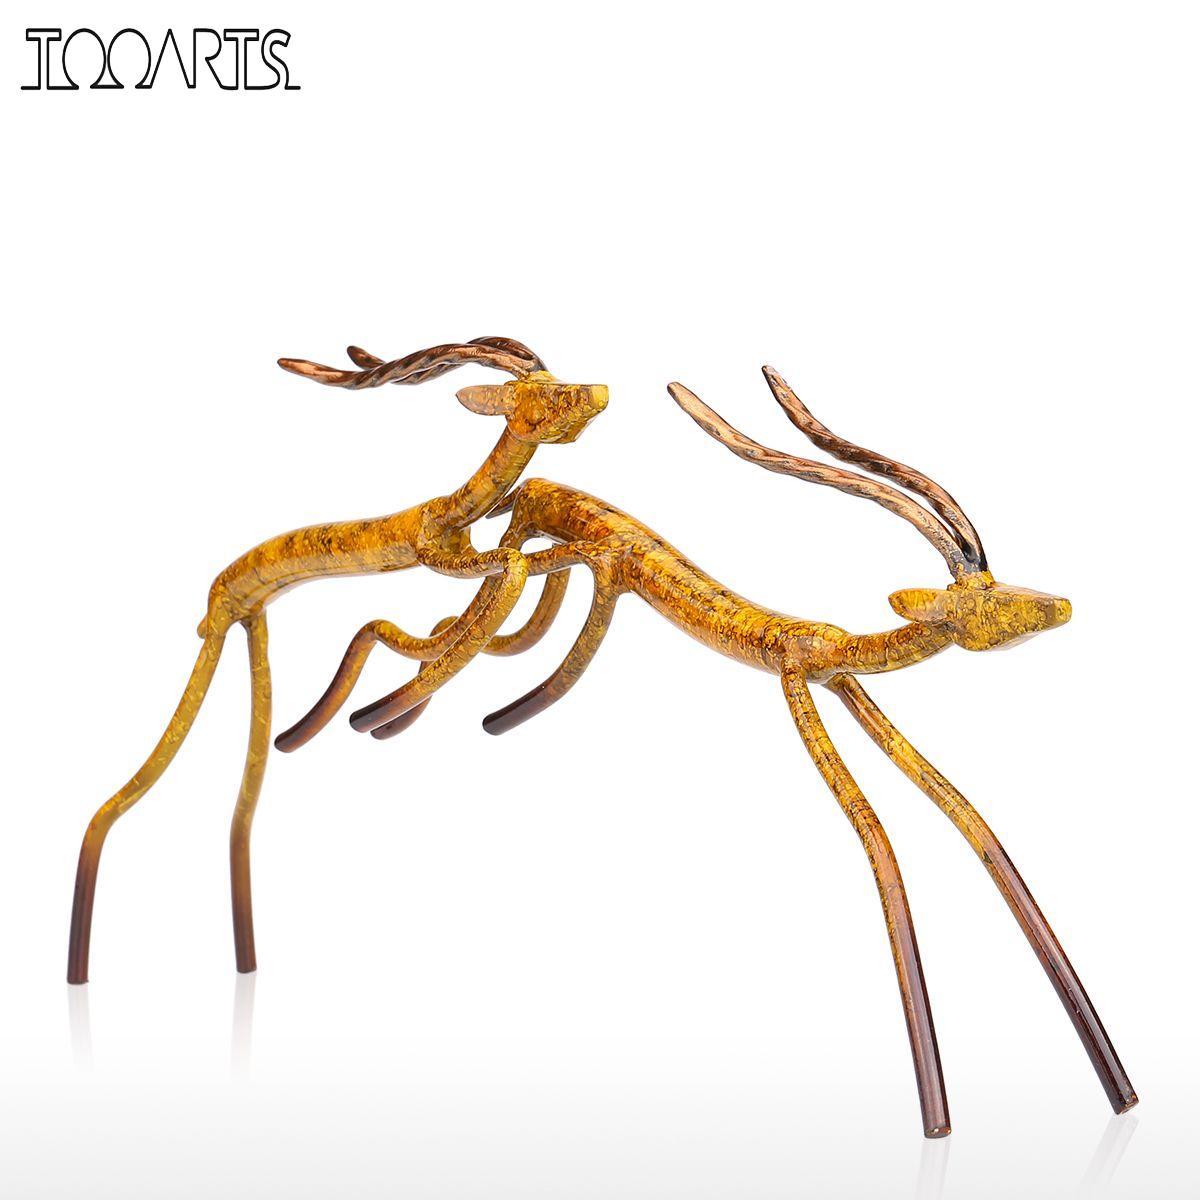 Tooarts 2 вида Leaping Antilope Figurine Iron Figurine Home Decor Crafts Метални животни занаяти подарък за домашен офис